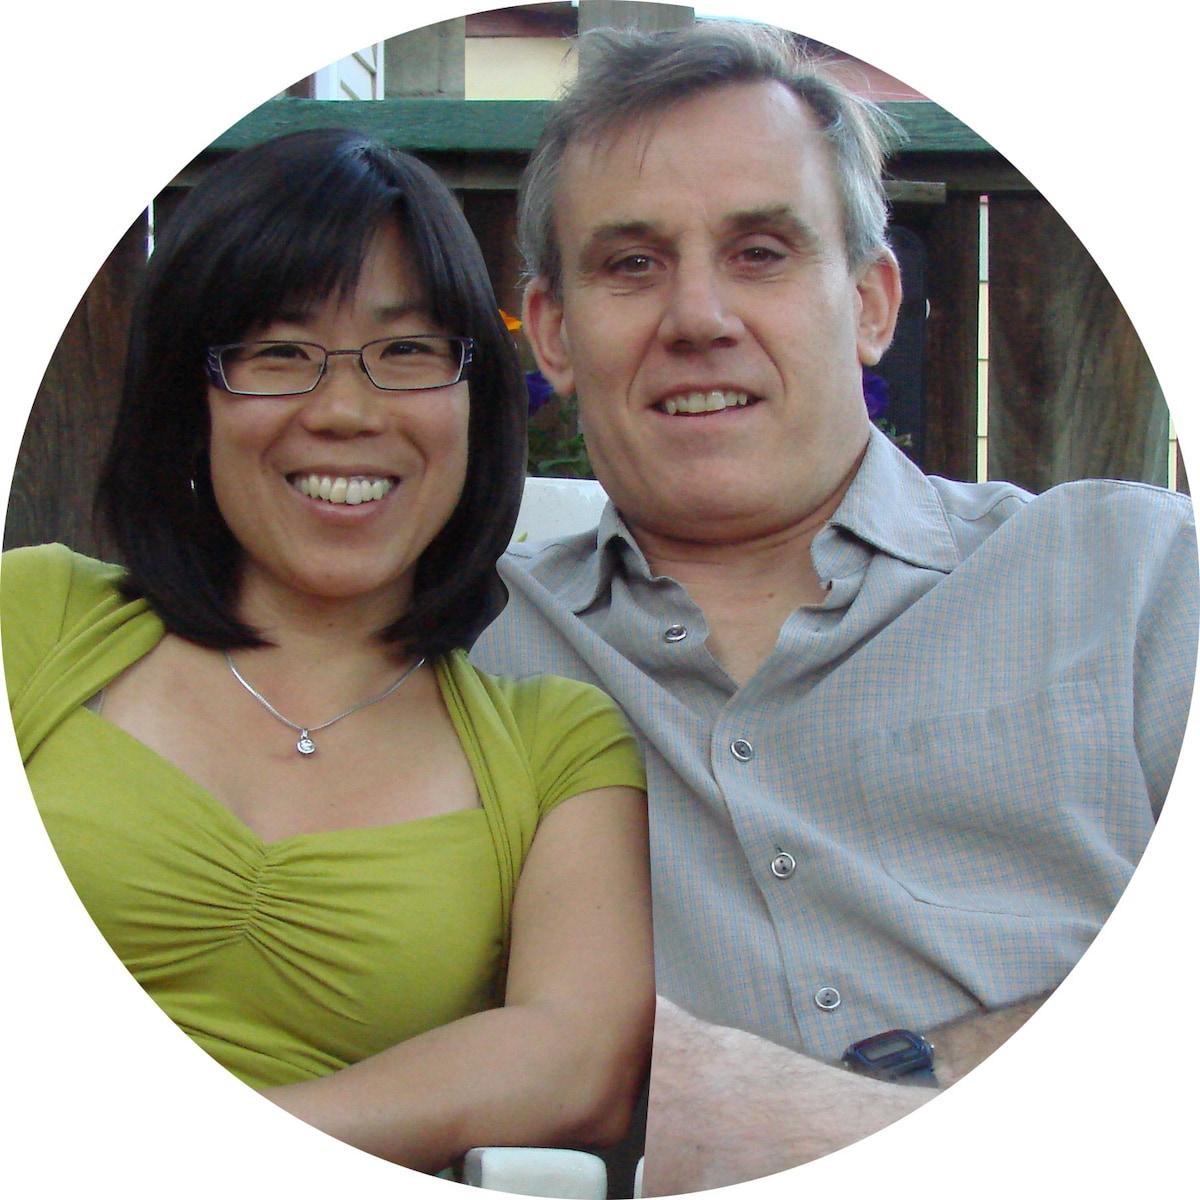 Doug & Michelle from Toronto